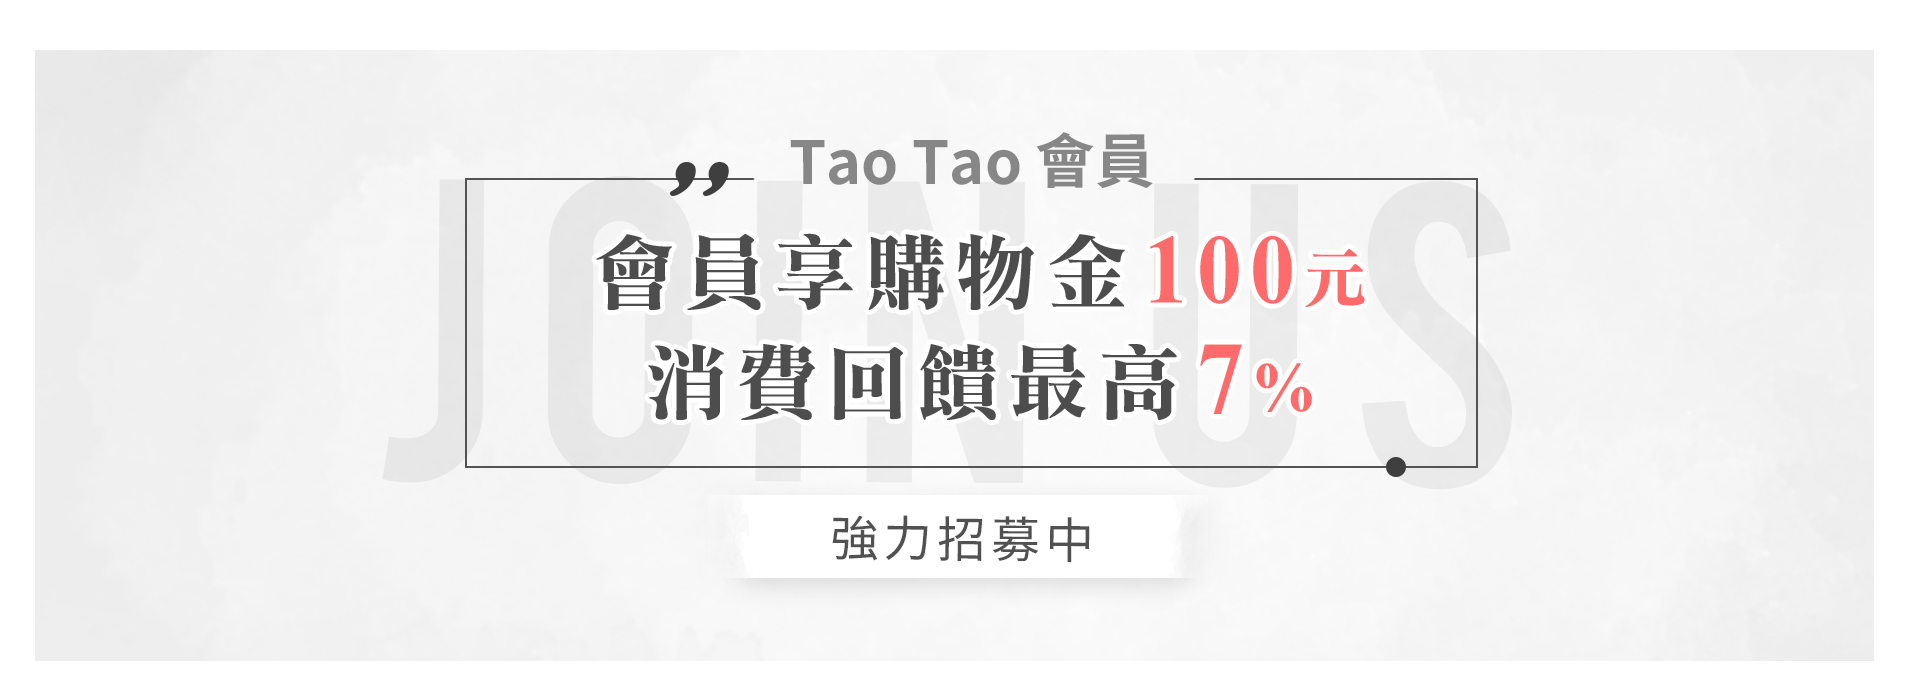 TAO TAO 保險套專賣網,會員招募中